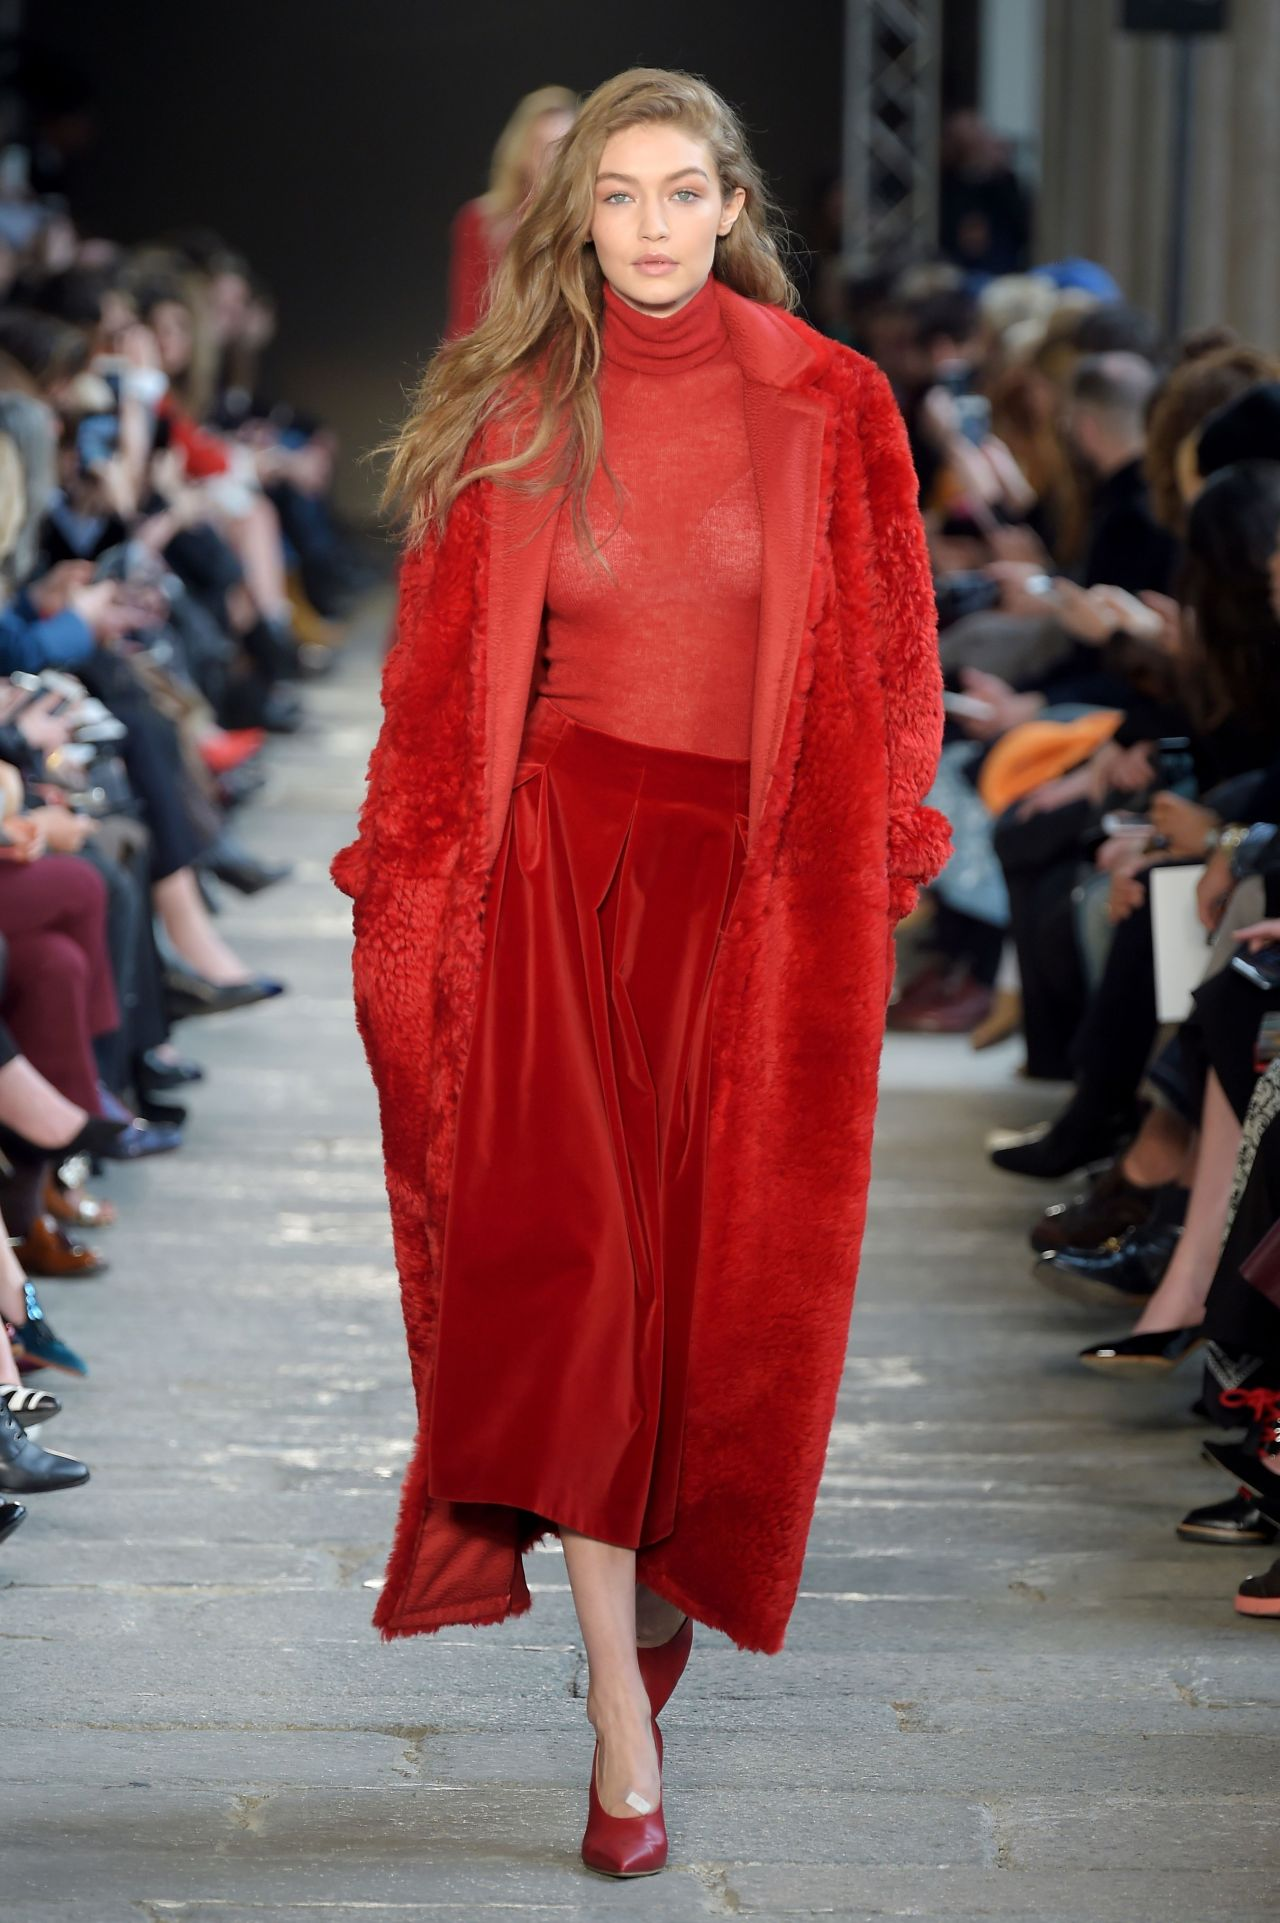 Fashion In Usa 2016: Gigi Hadid In Milan Fashion Week